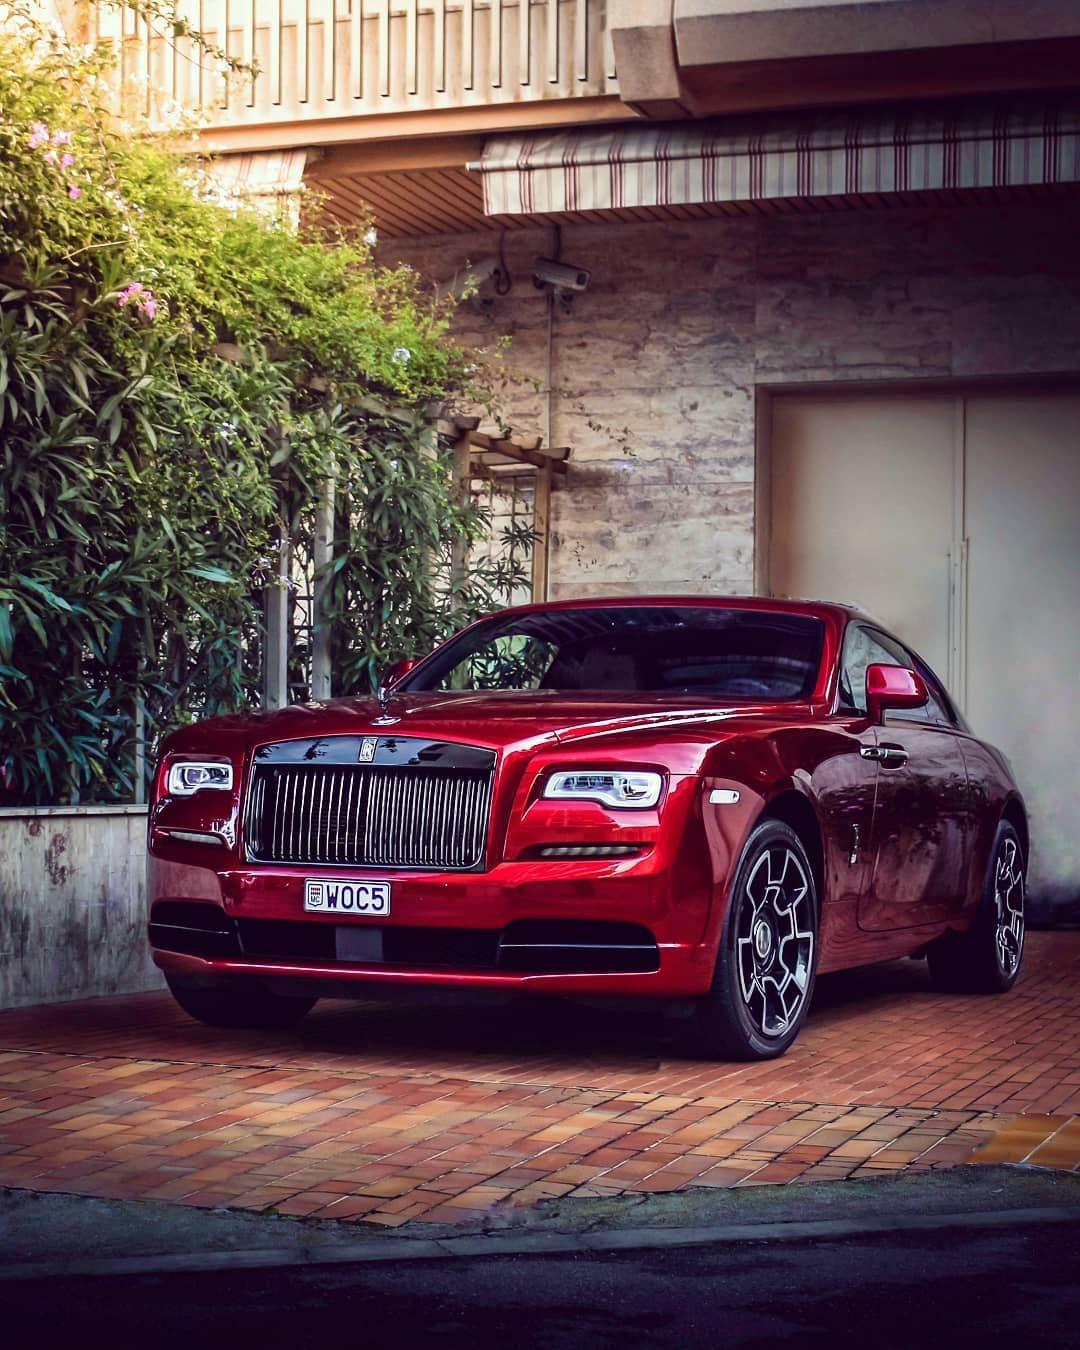 Royal Rolls Royce Luxury Cars Rolls Royce Super Luxury Cars Rolls Royce